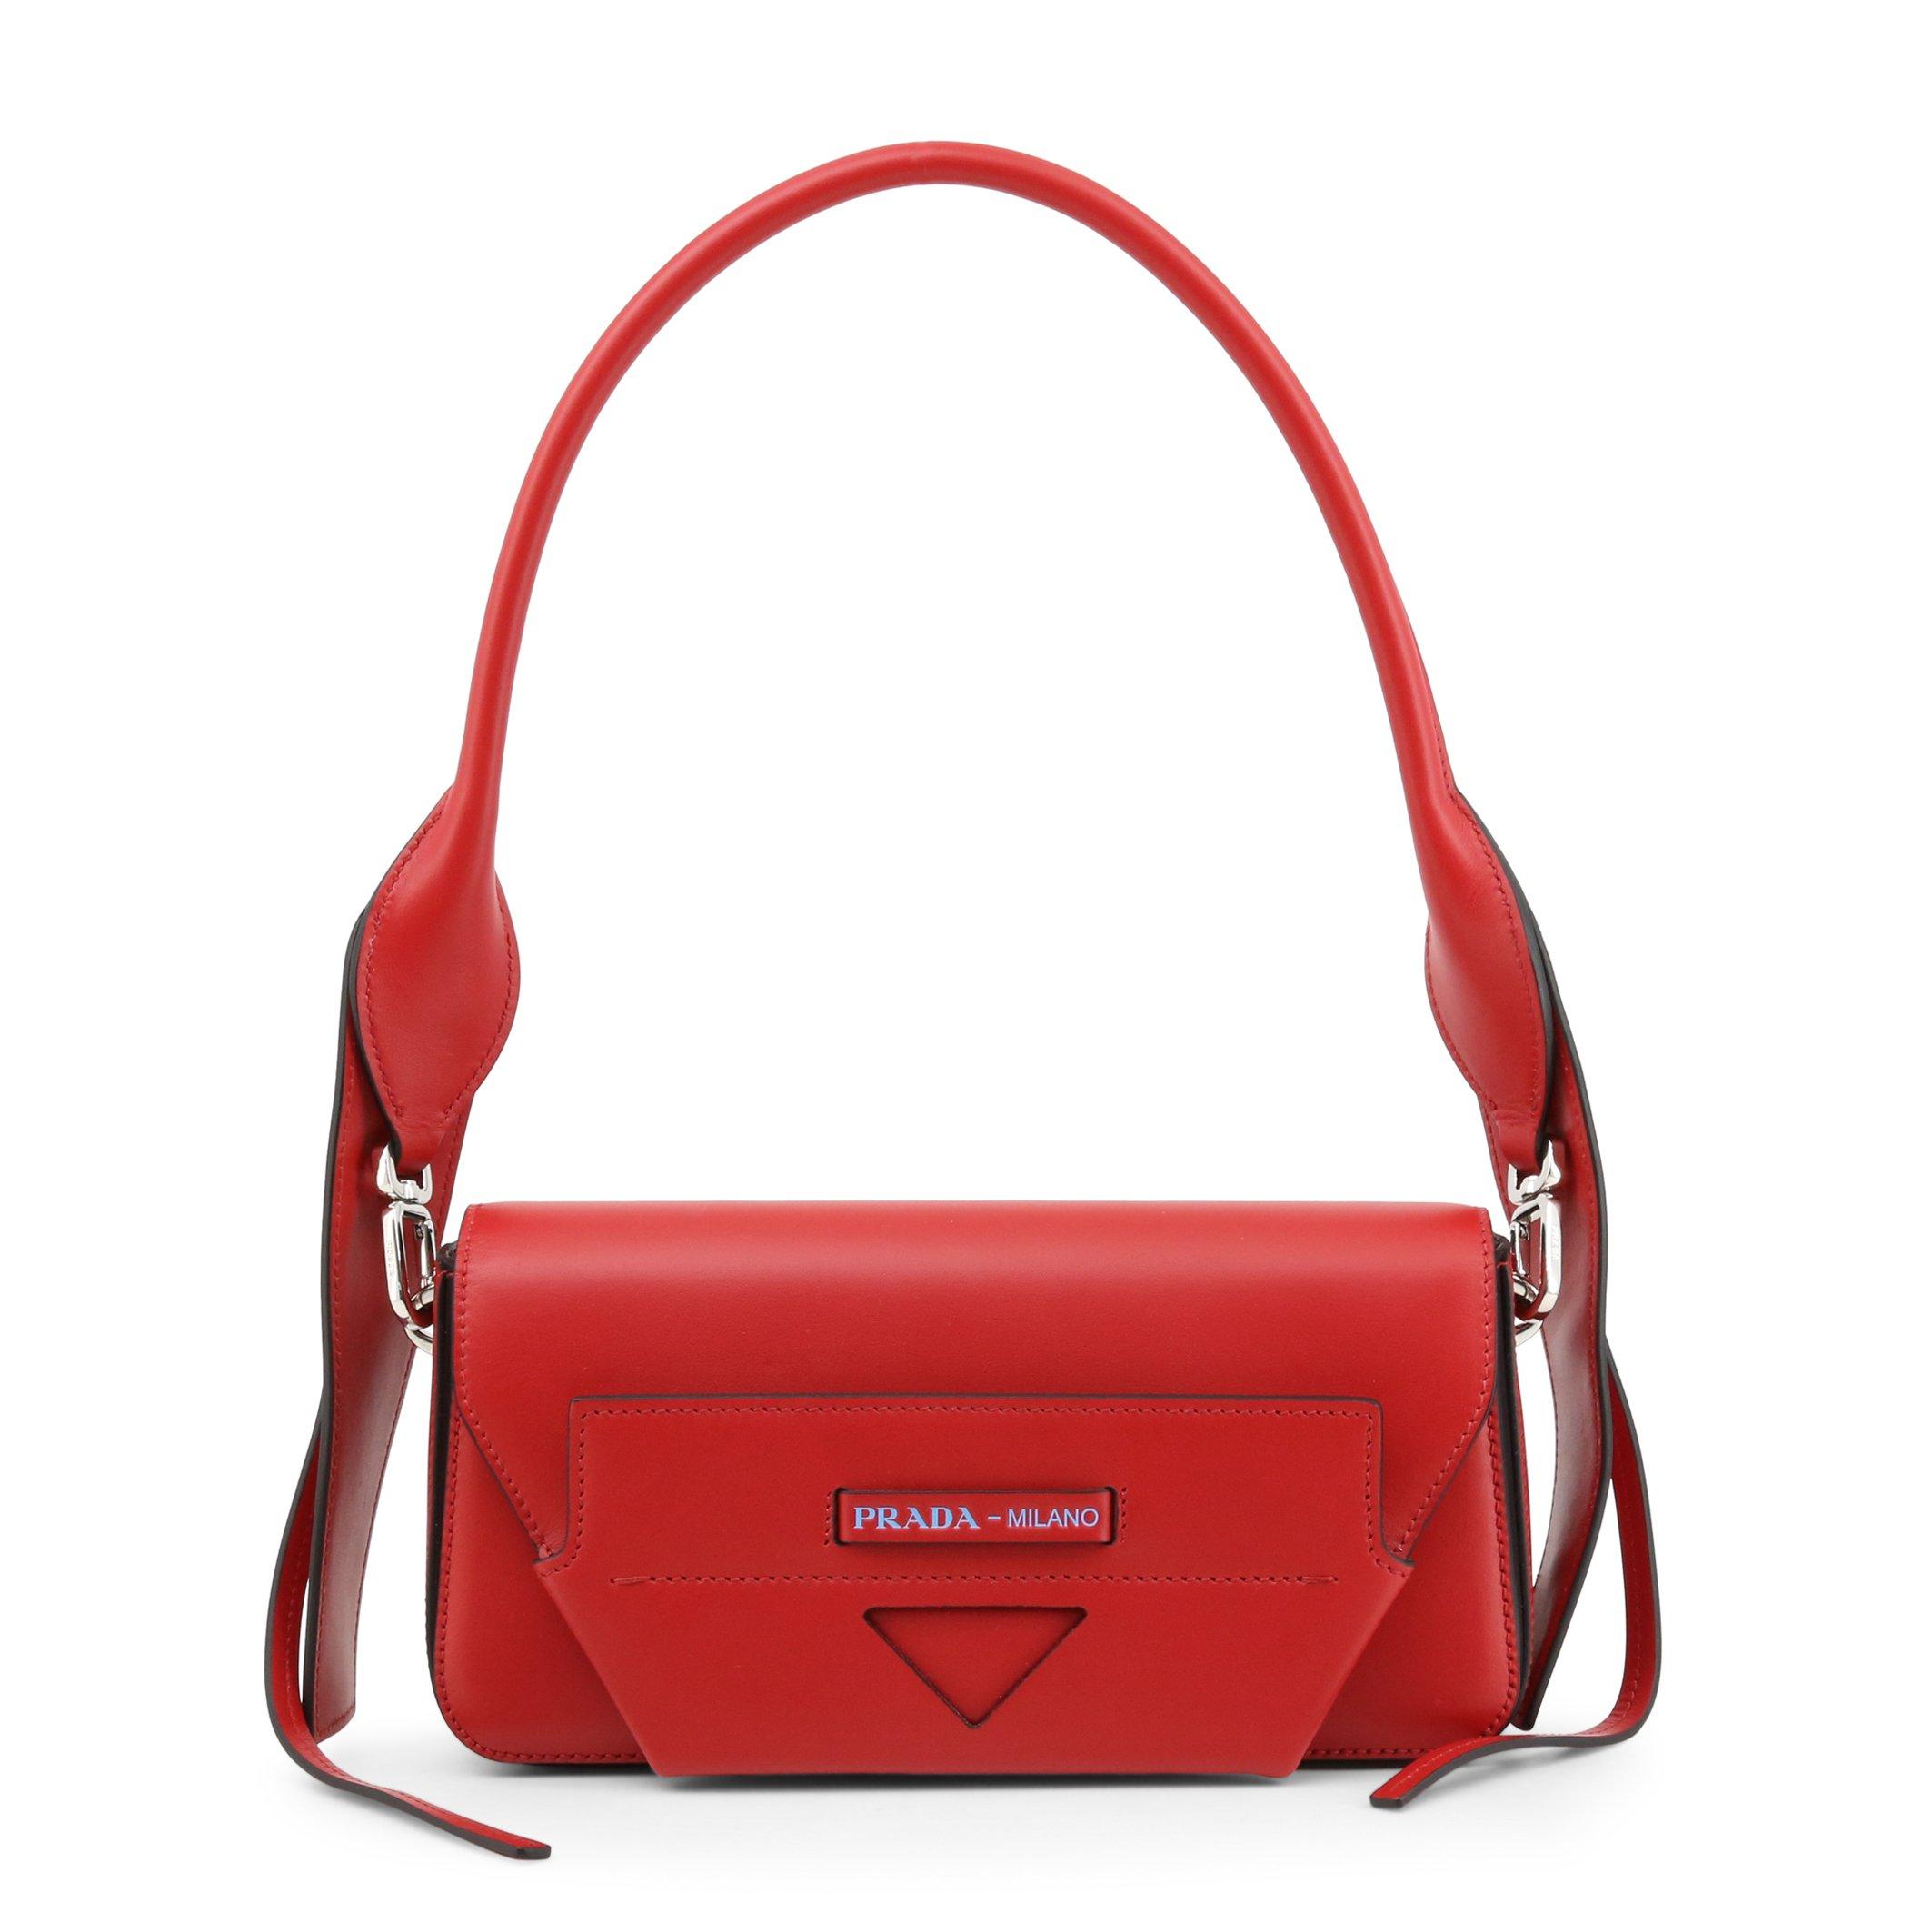 Prada Women's Shoulder Bag Blue 1BD166_CITY - red NOSIZE